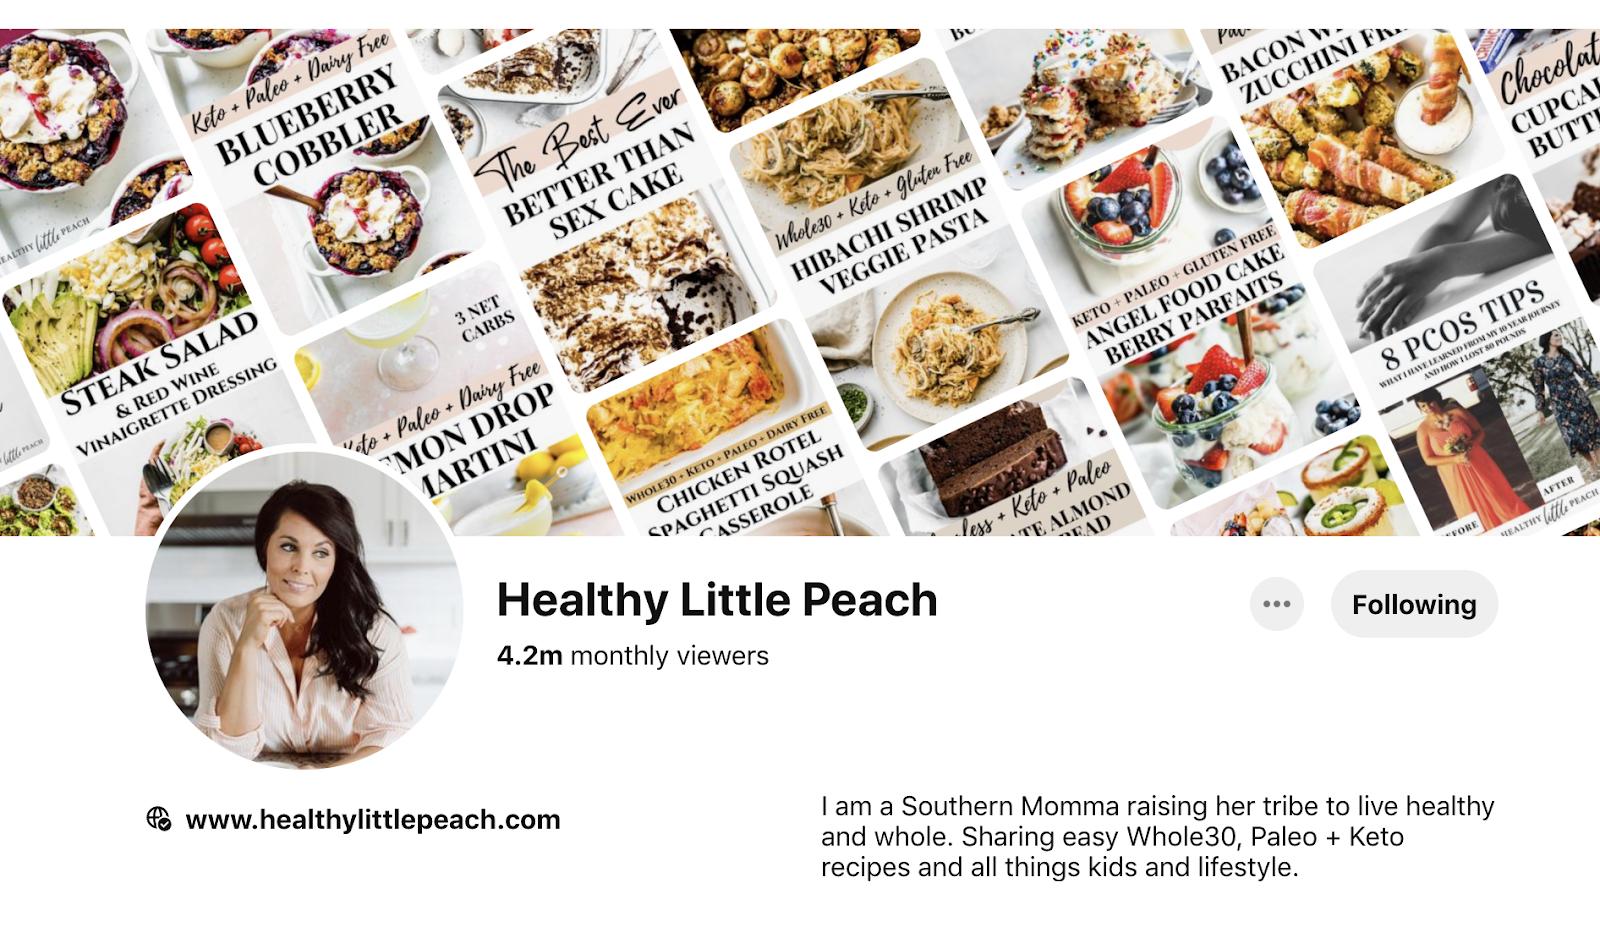 Healthy little peach